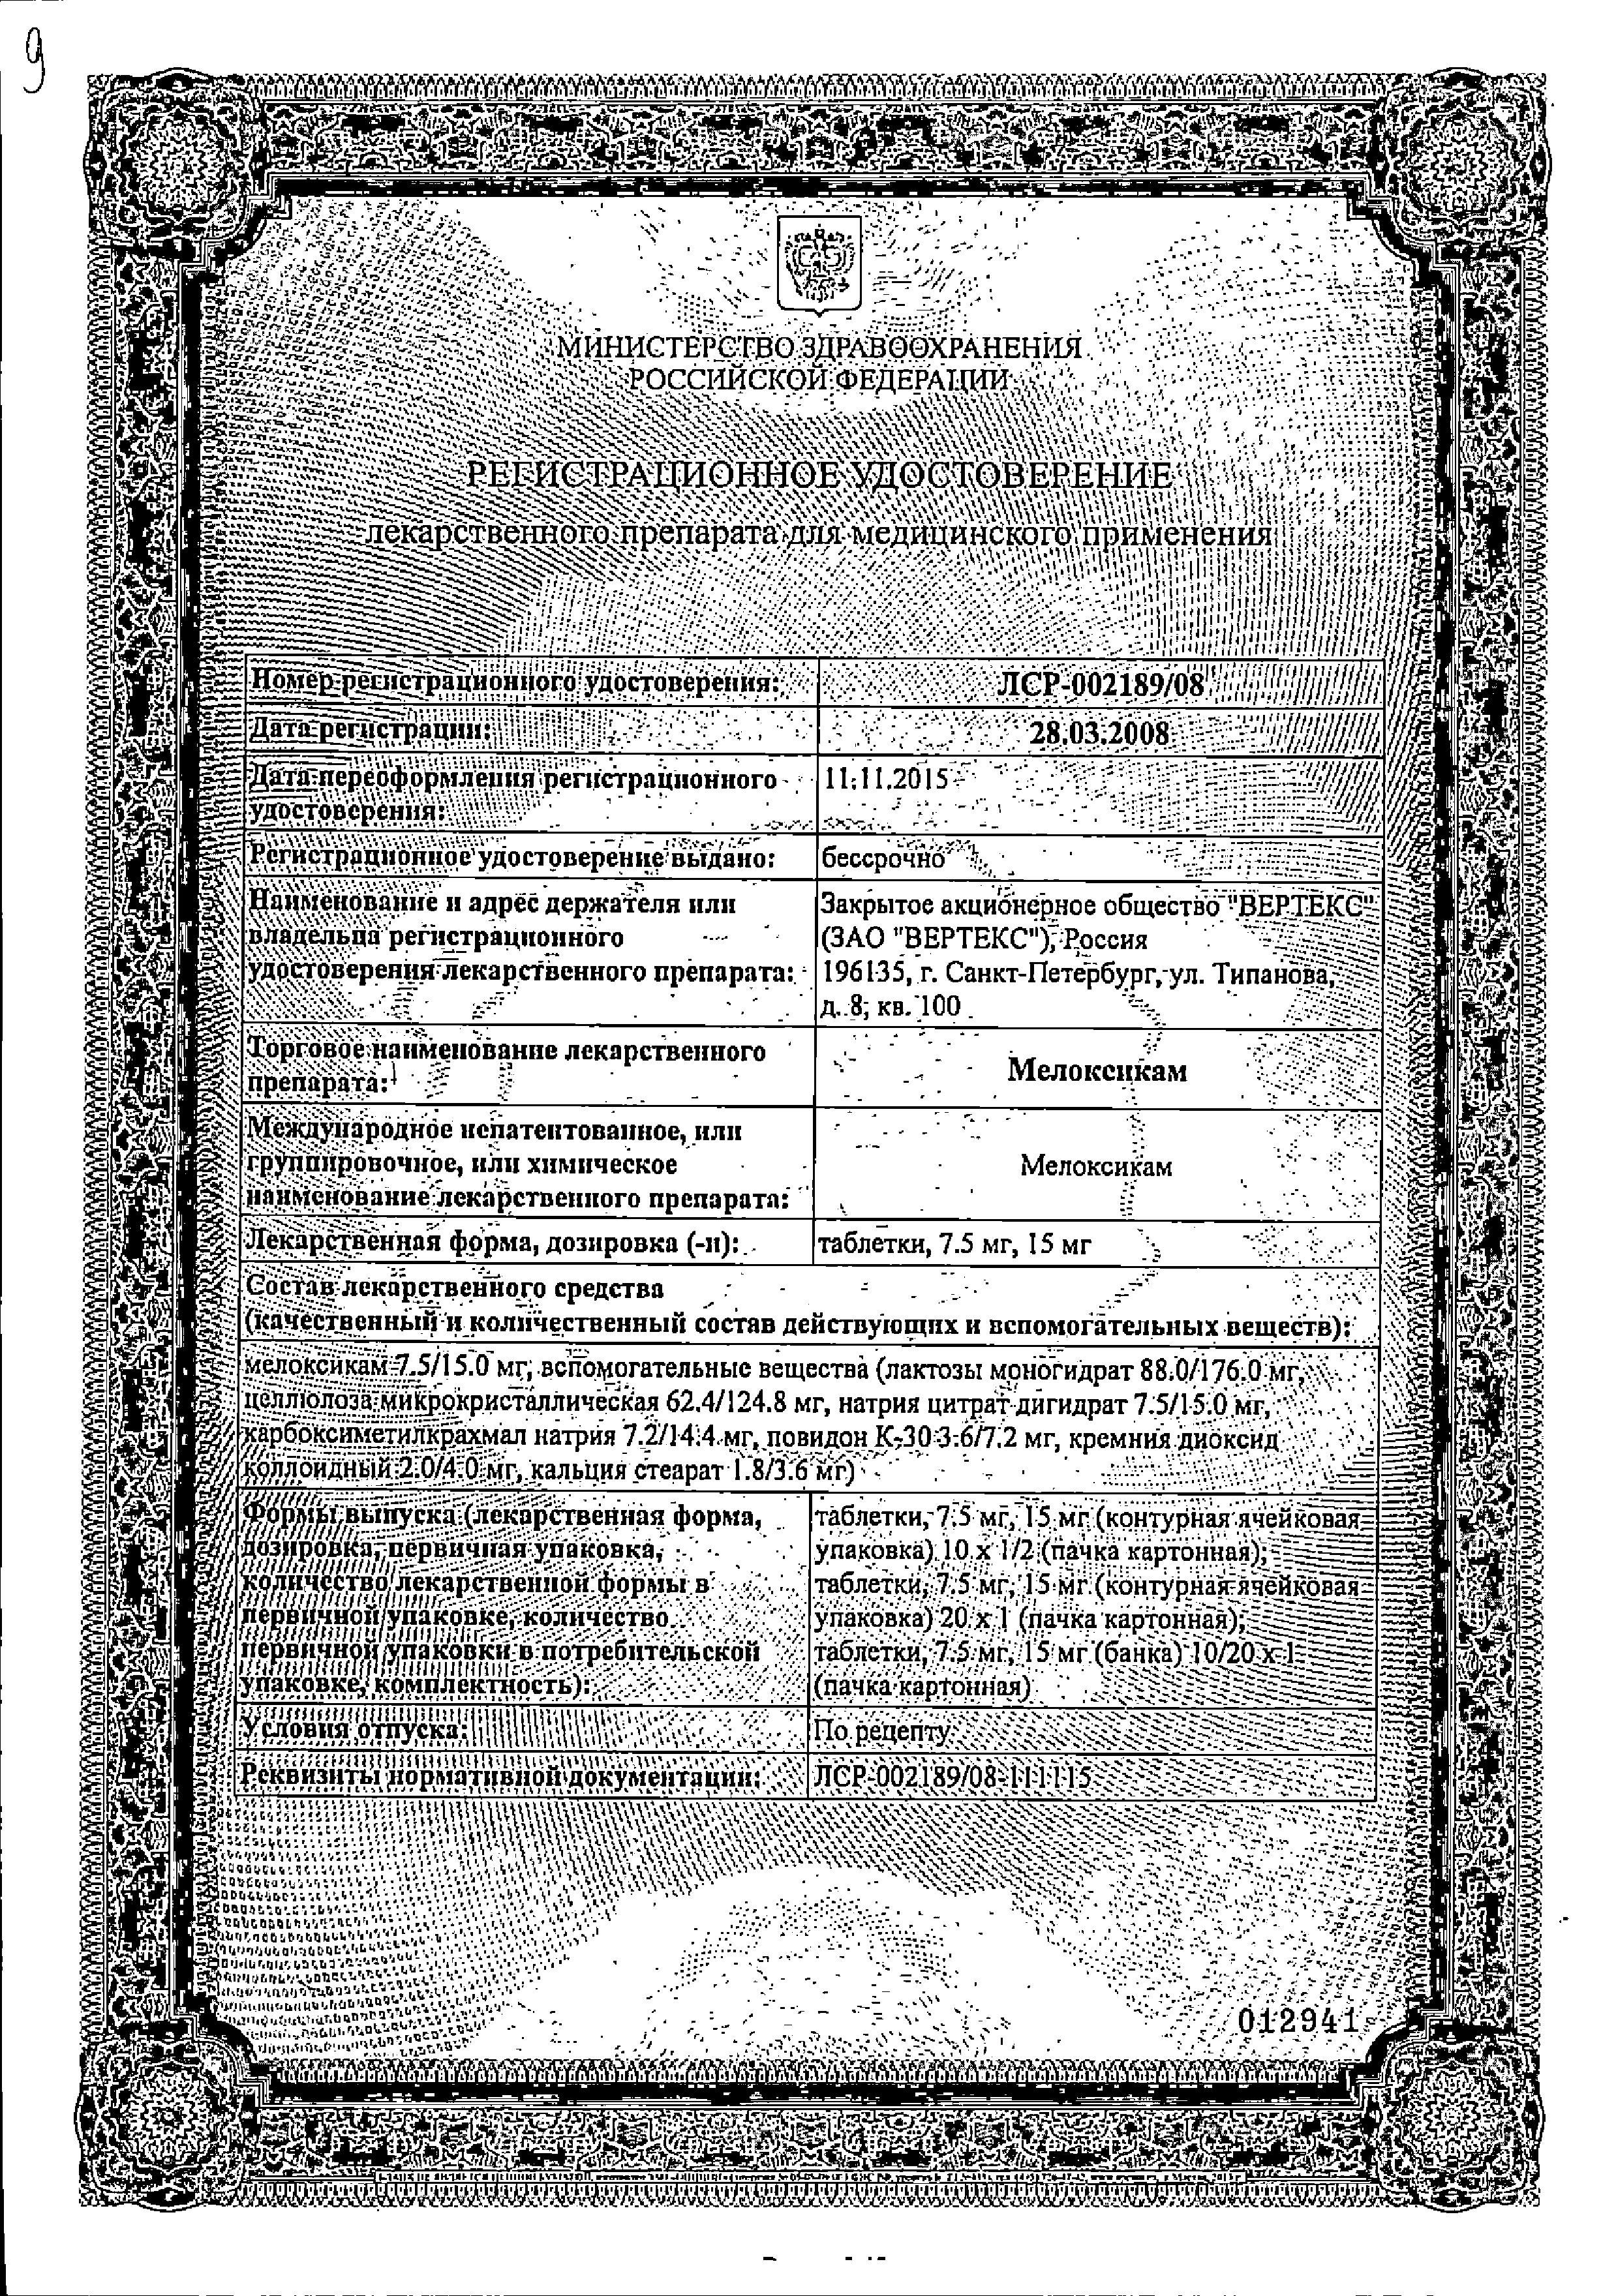 Мелоксикам сертификат